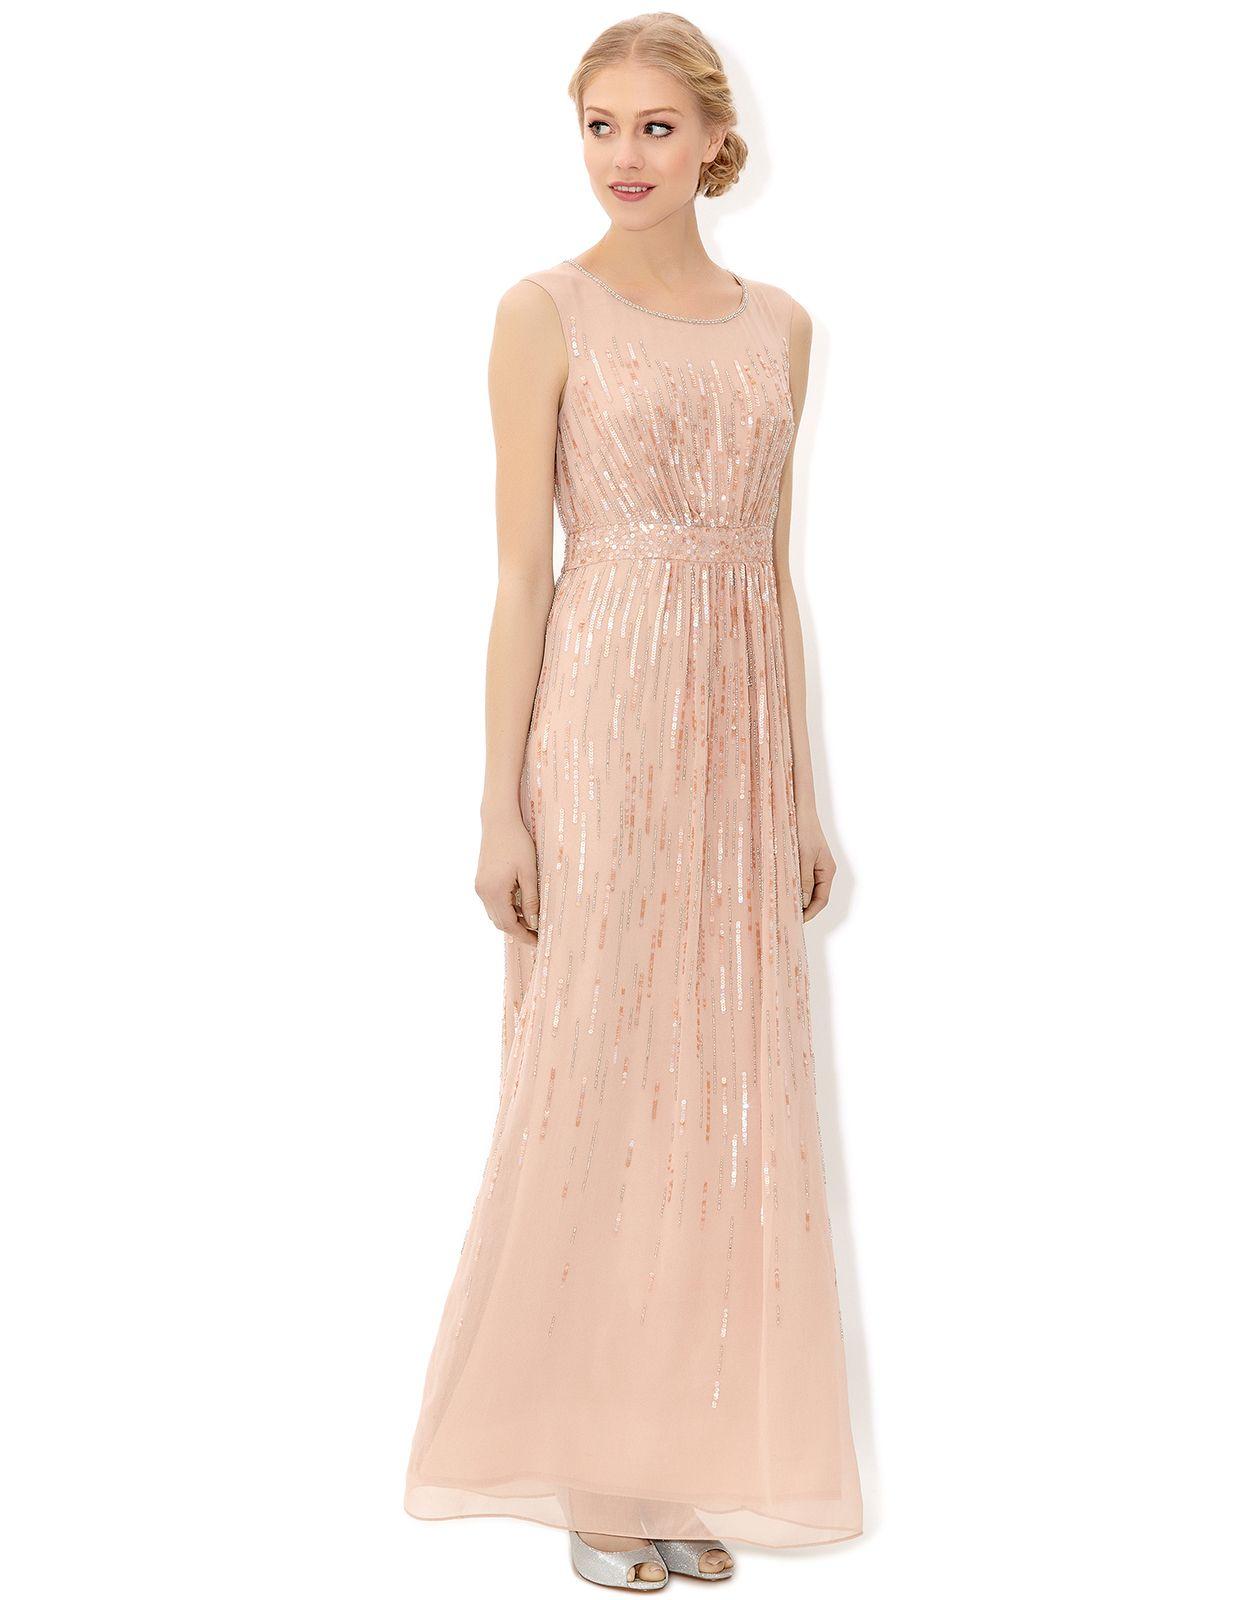 Angelina dress pink monsoon clothes pinterest monsoon angelina dress pink monsoon ombrellifo Choice Image